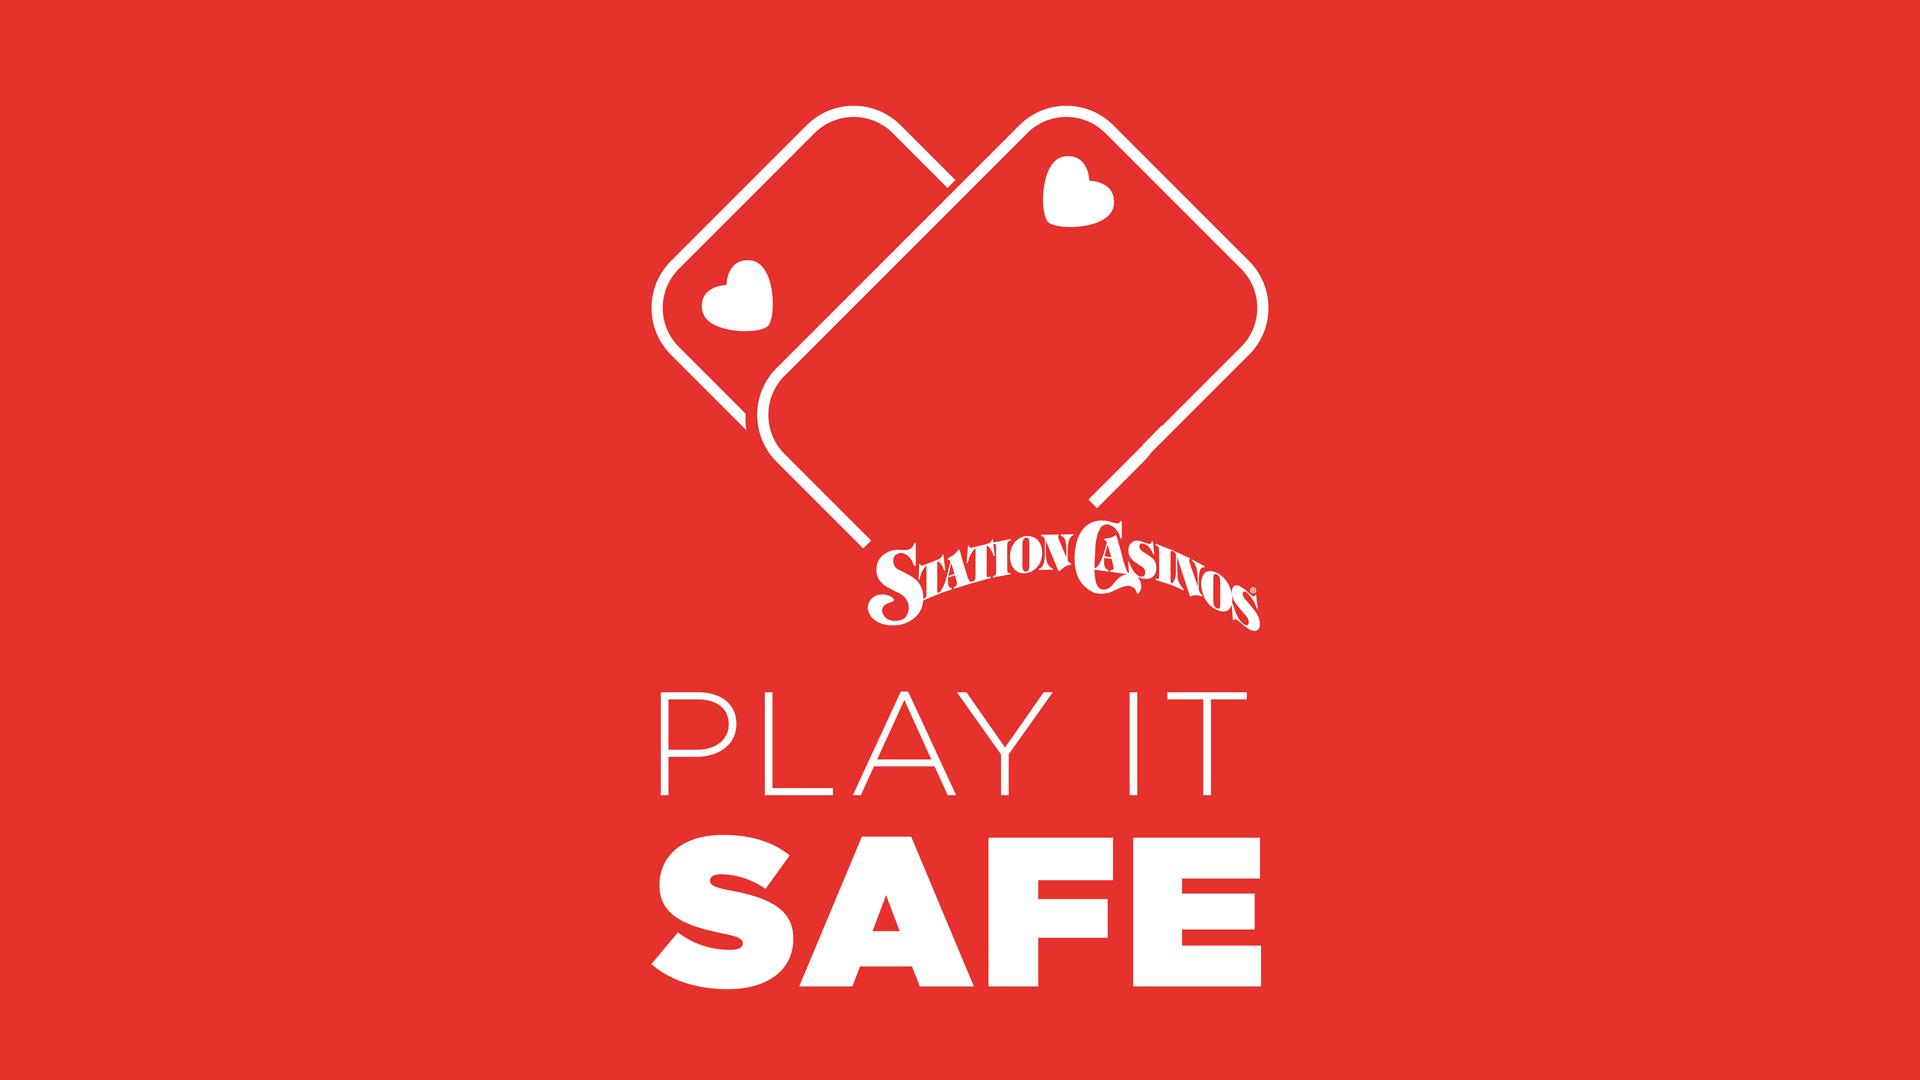 Play It Safe logo